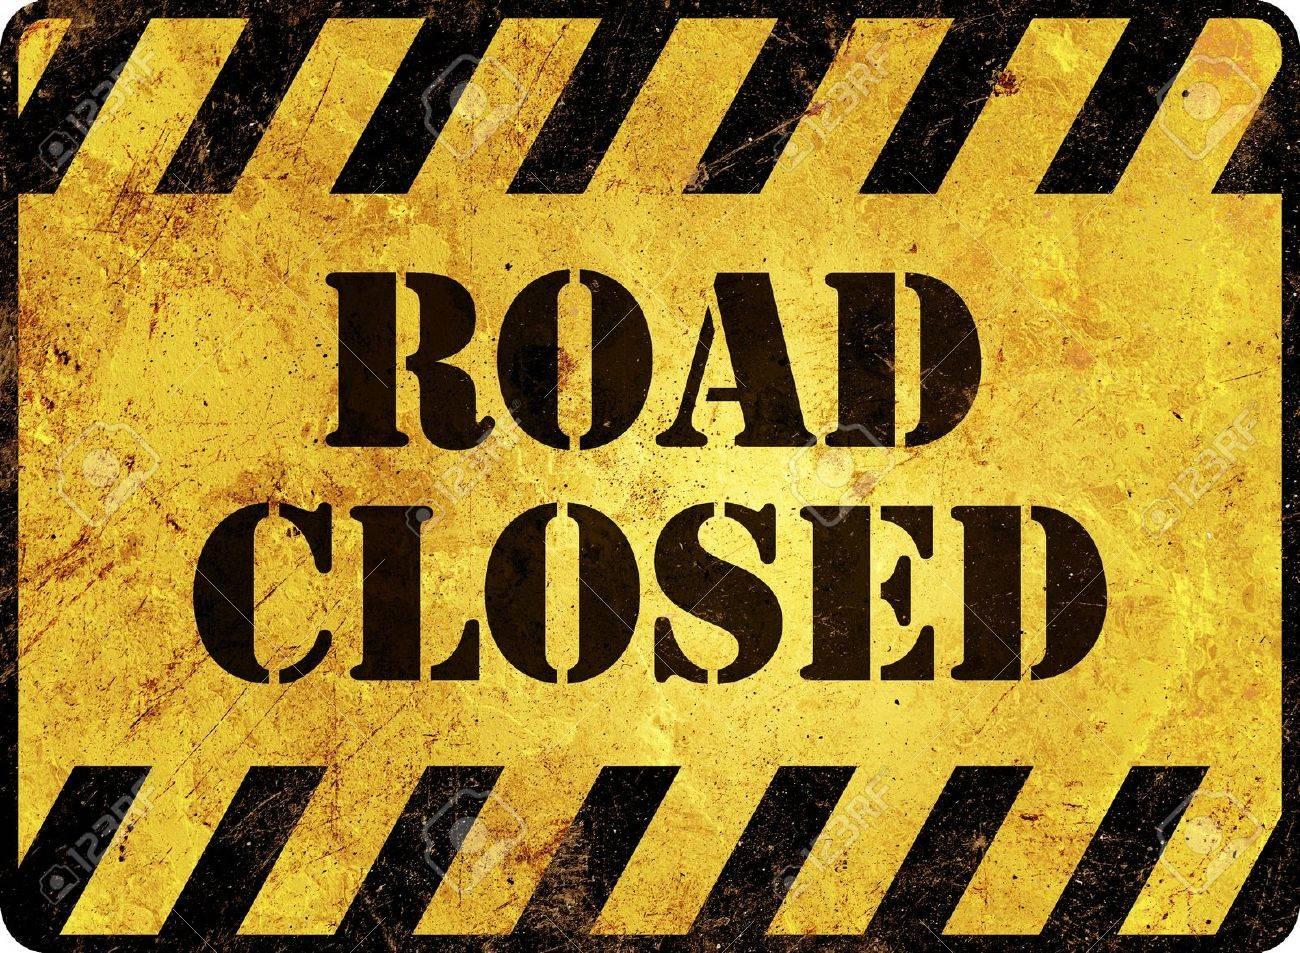 Road Closed Warning Sign Stock Photo - 16761302